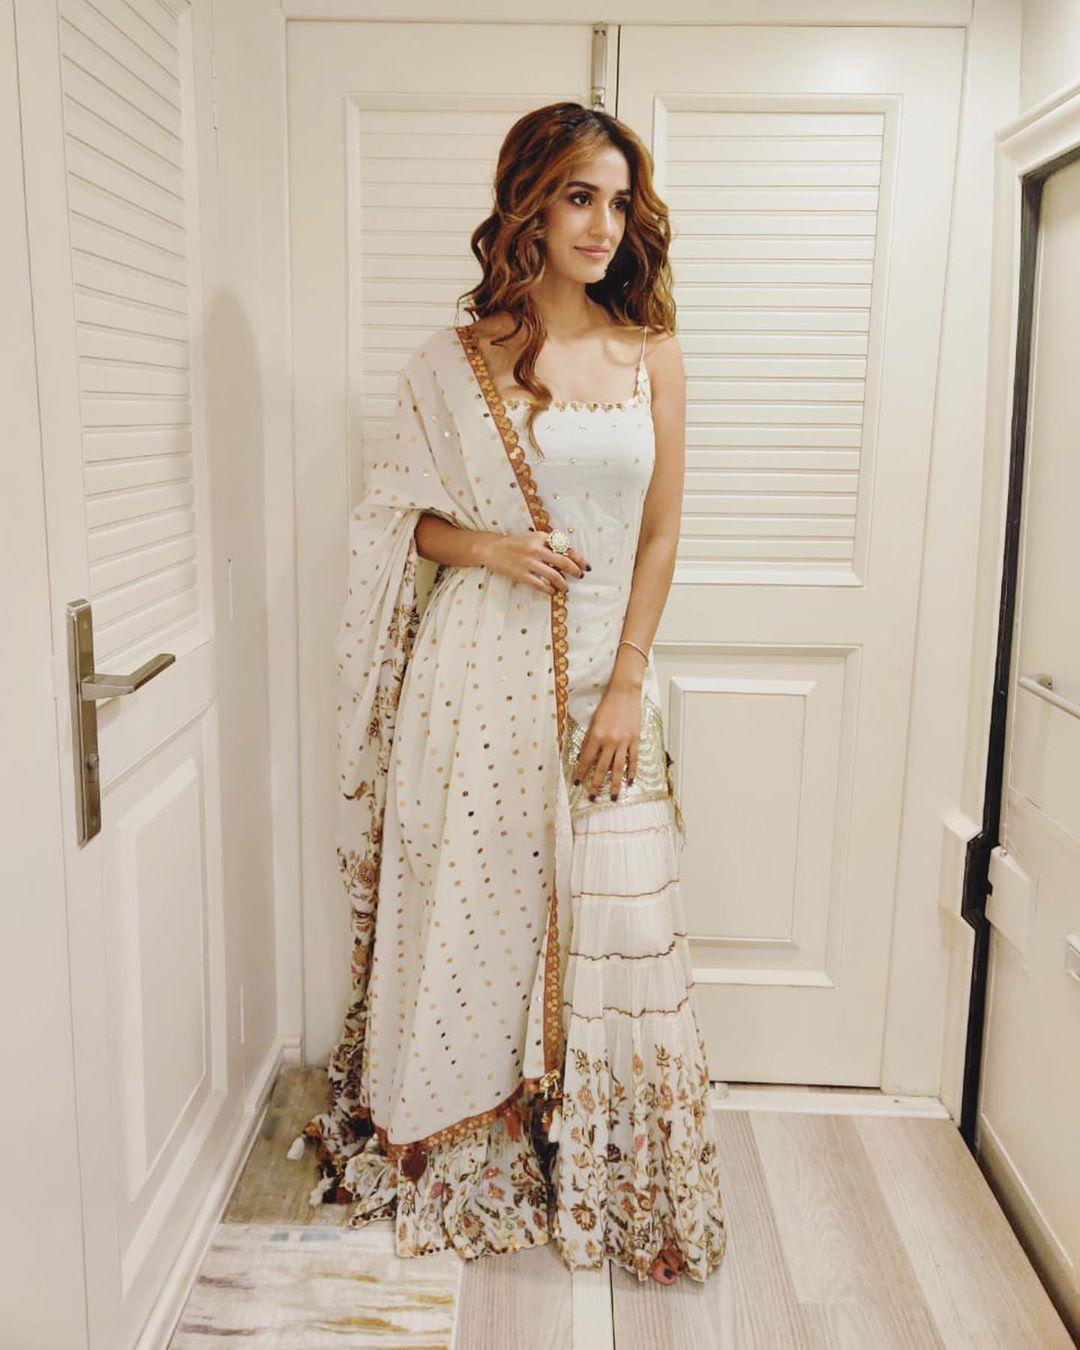 Disha Patani in White Ethnic dress